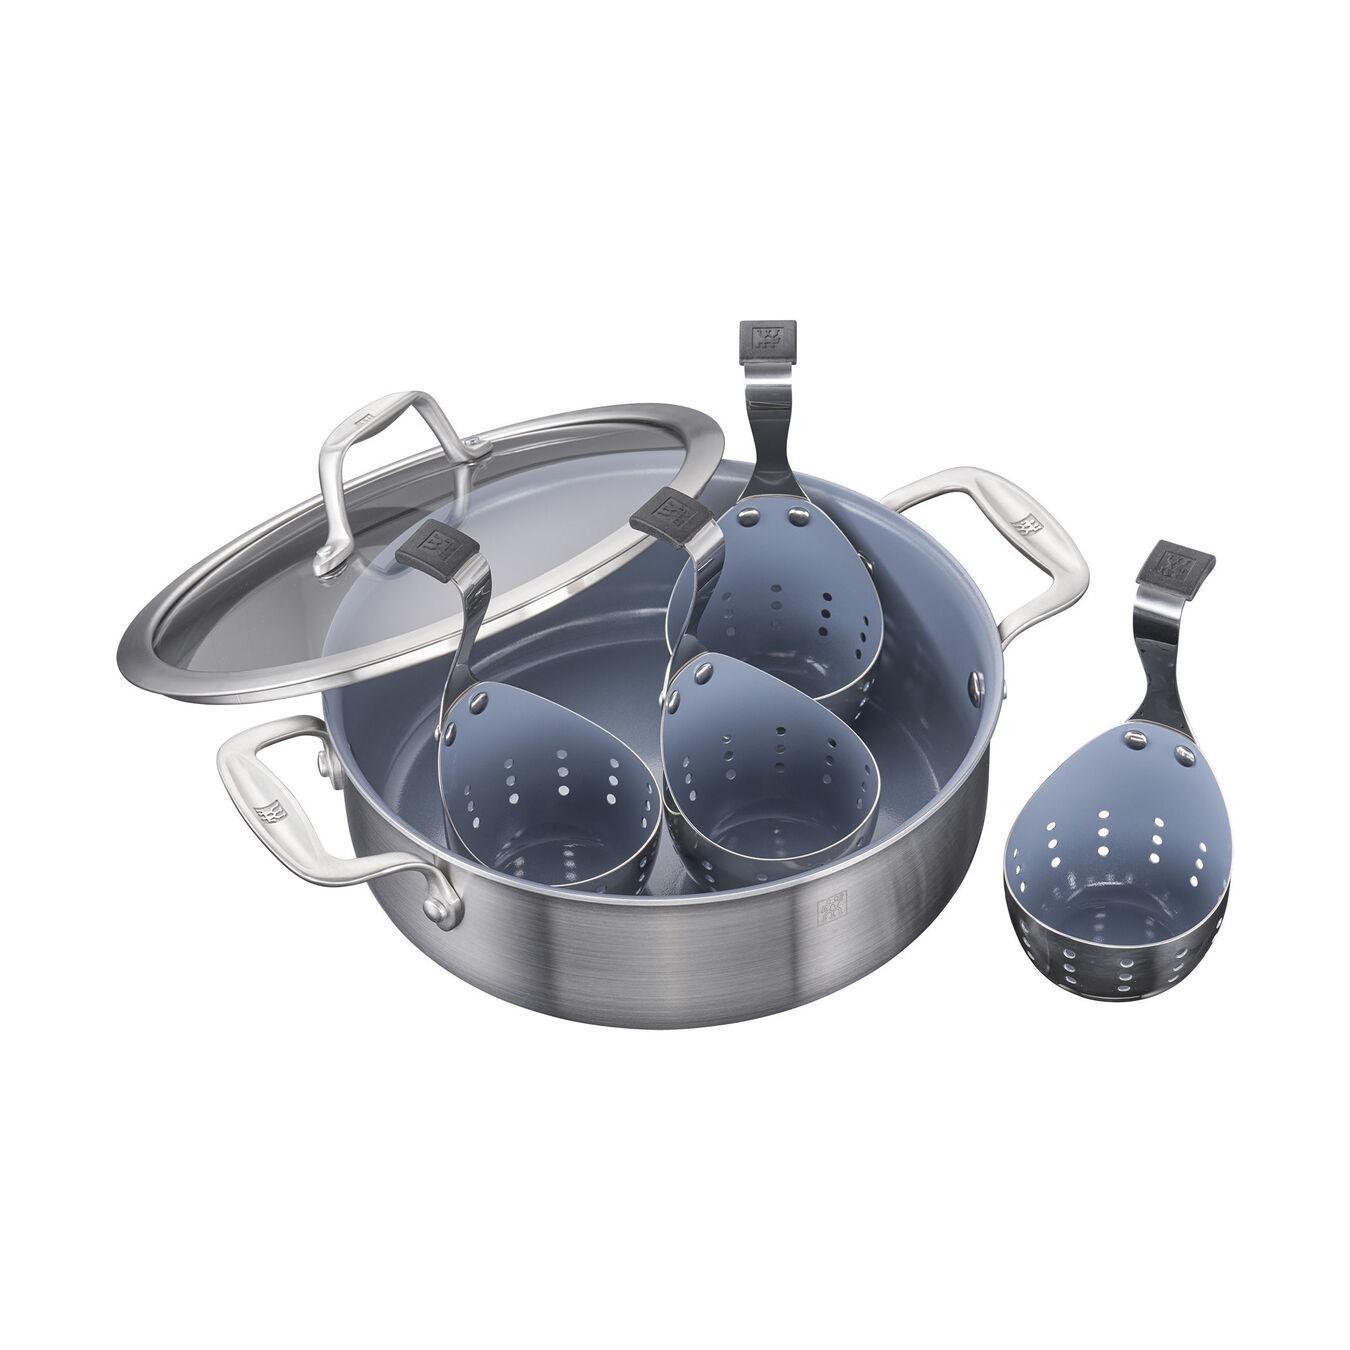 3-ply 6-pc Stainless Steel Ceramic Nonstick Breakfast Pan & Egg Poacher Set,,large 1